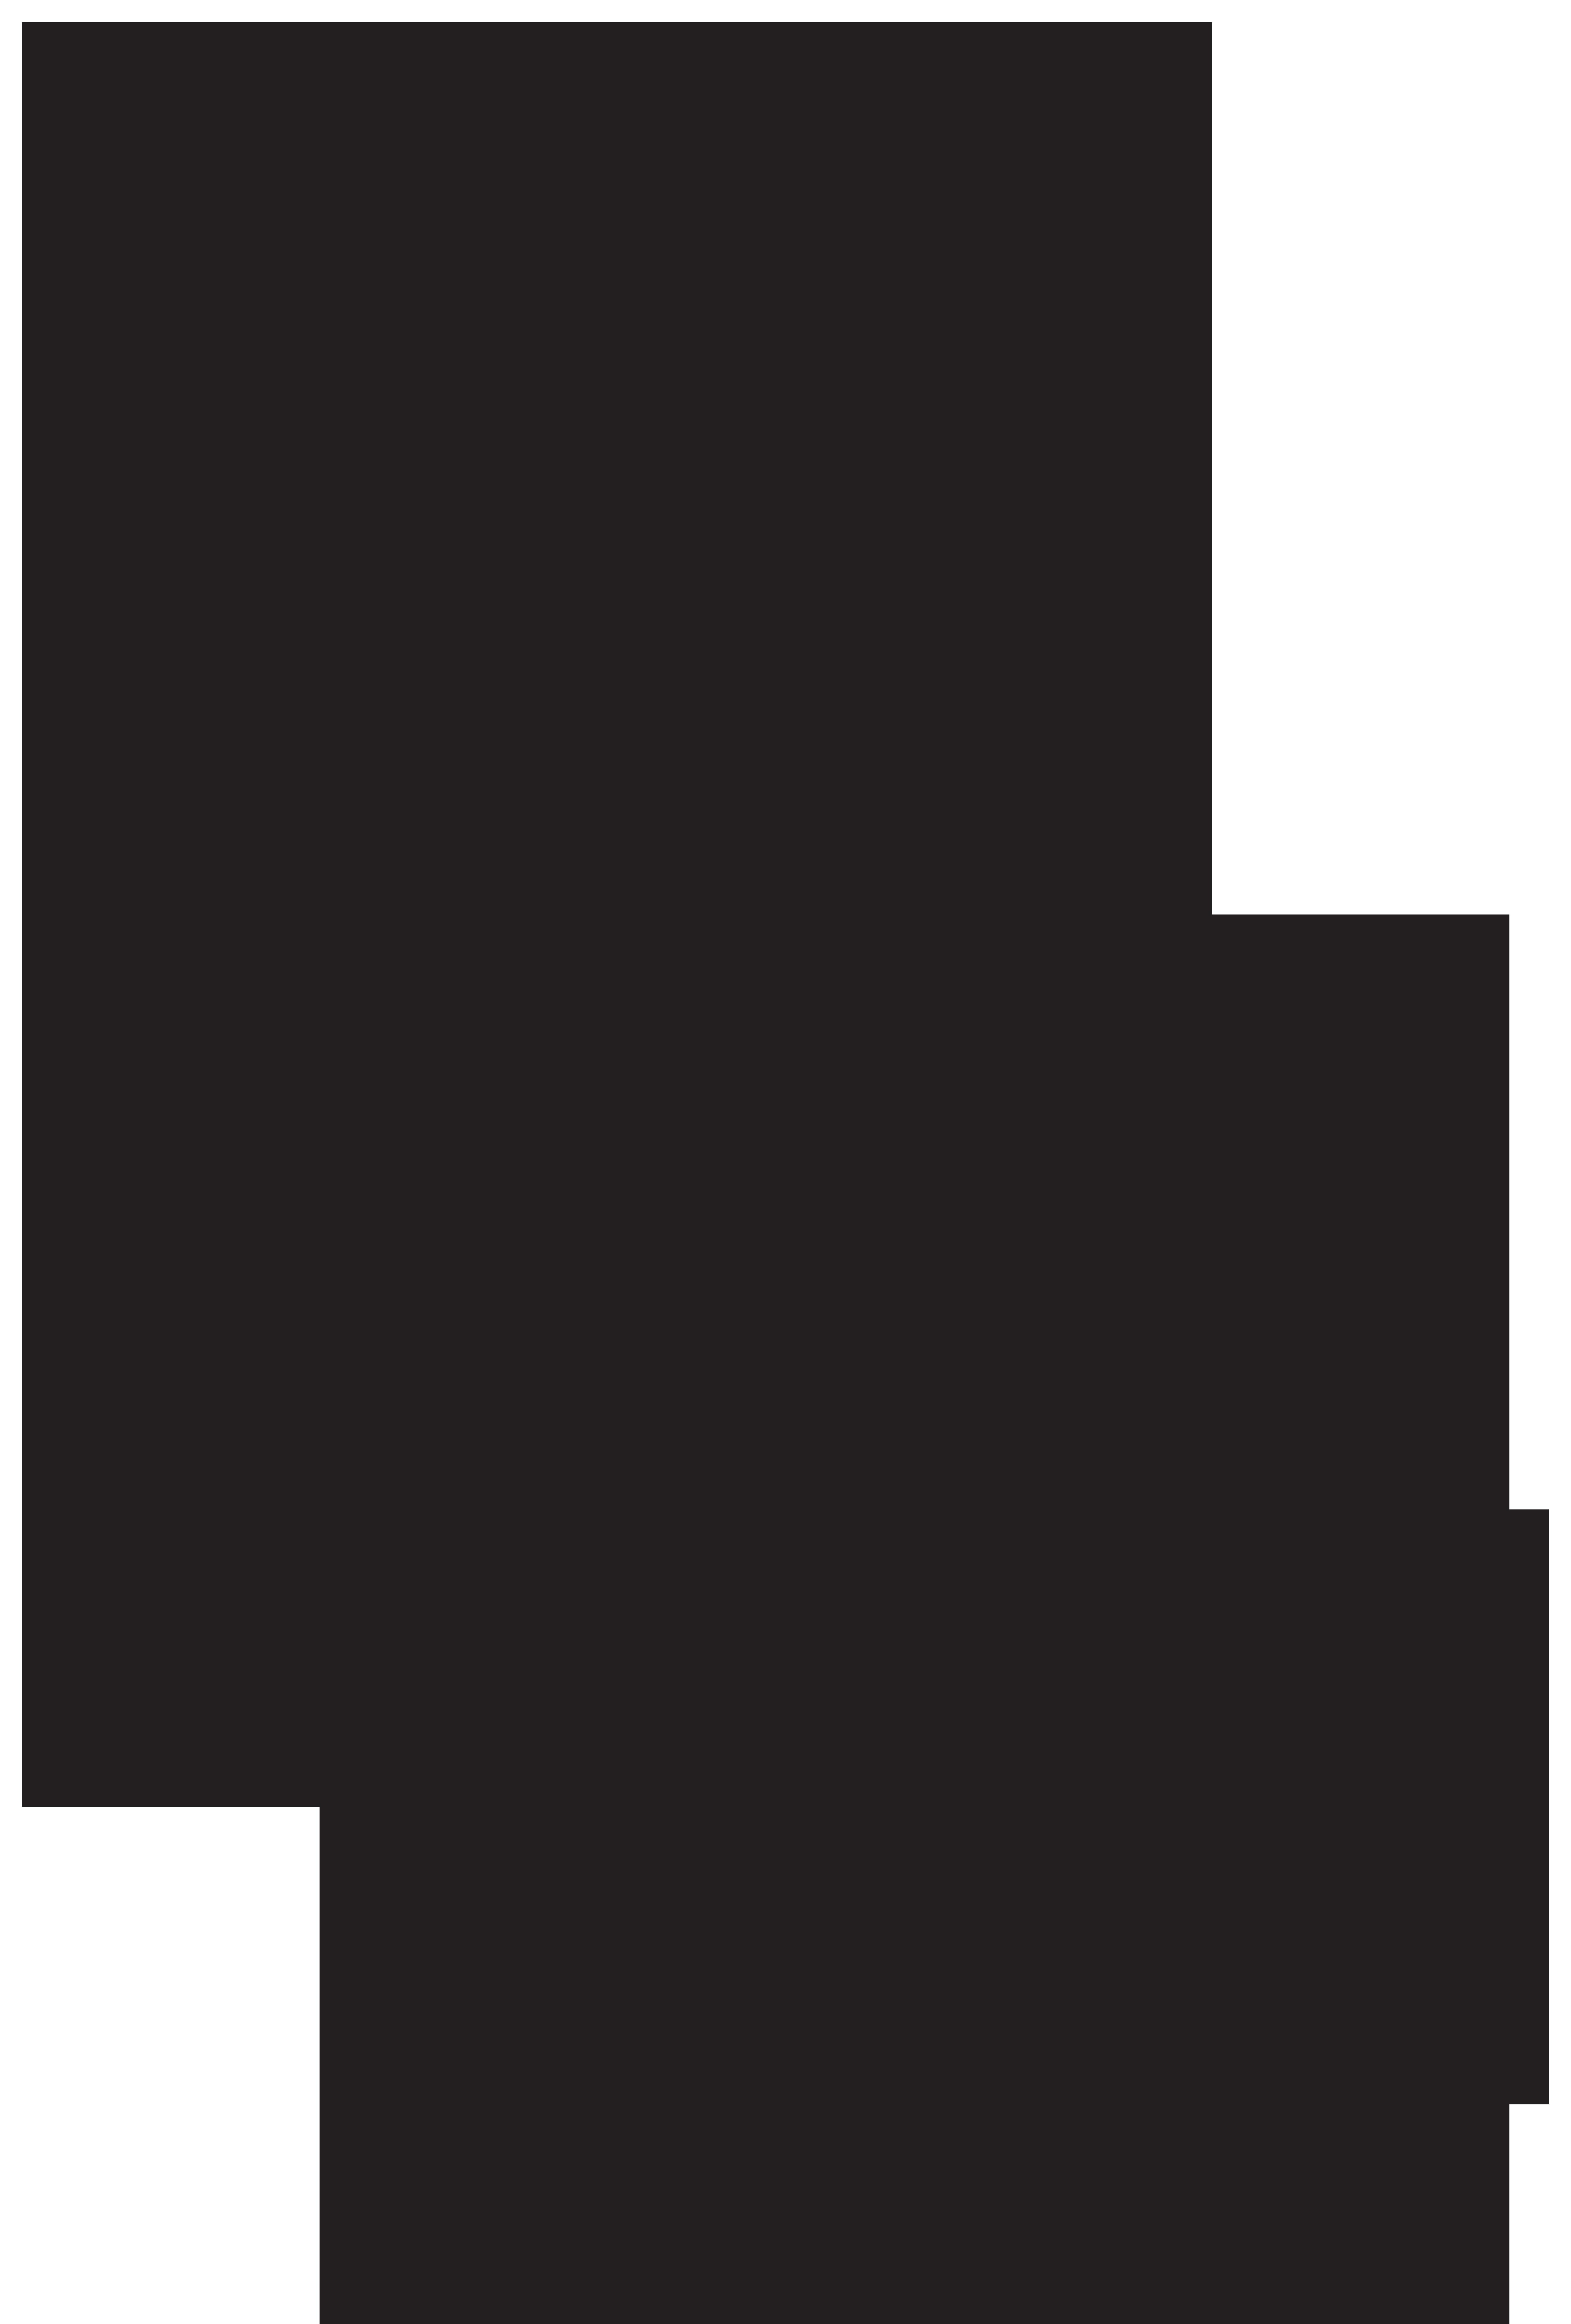 5408x8000 Palm Trees Silhouette Clip Art Imageu200b Gallery Yopriceville